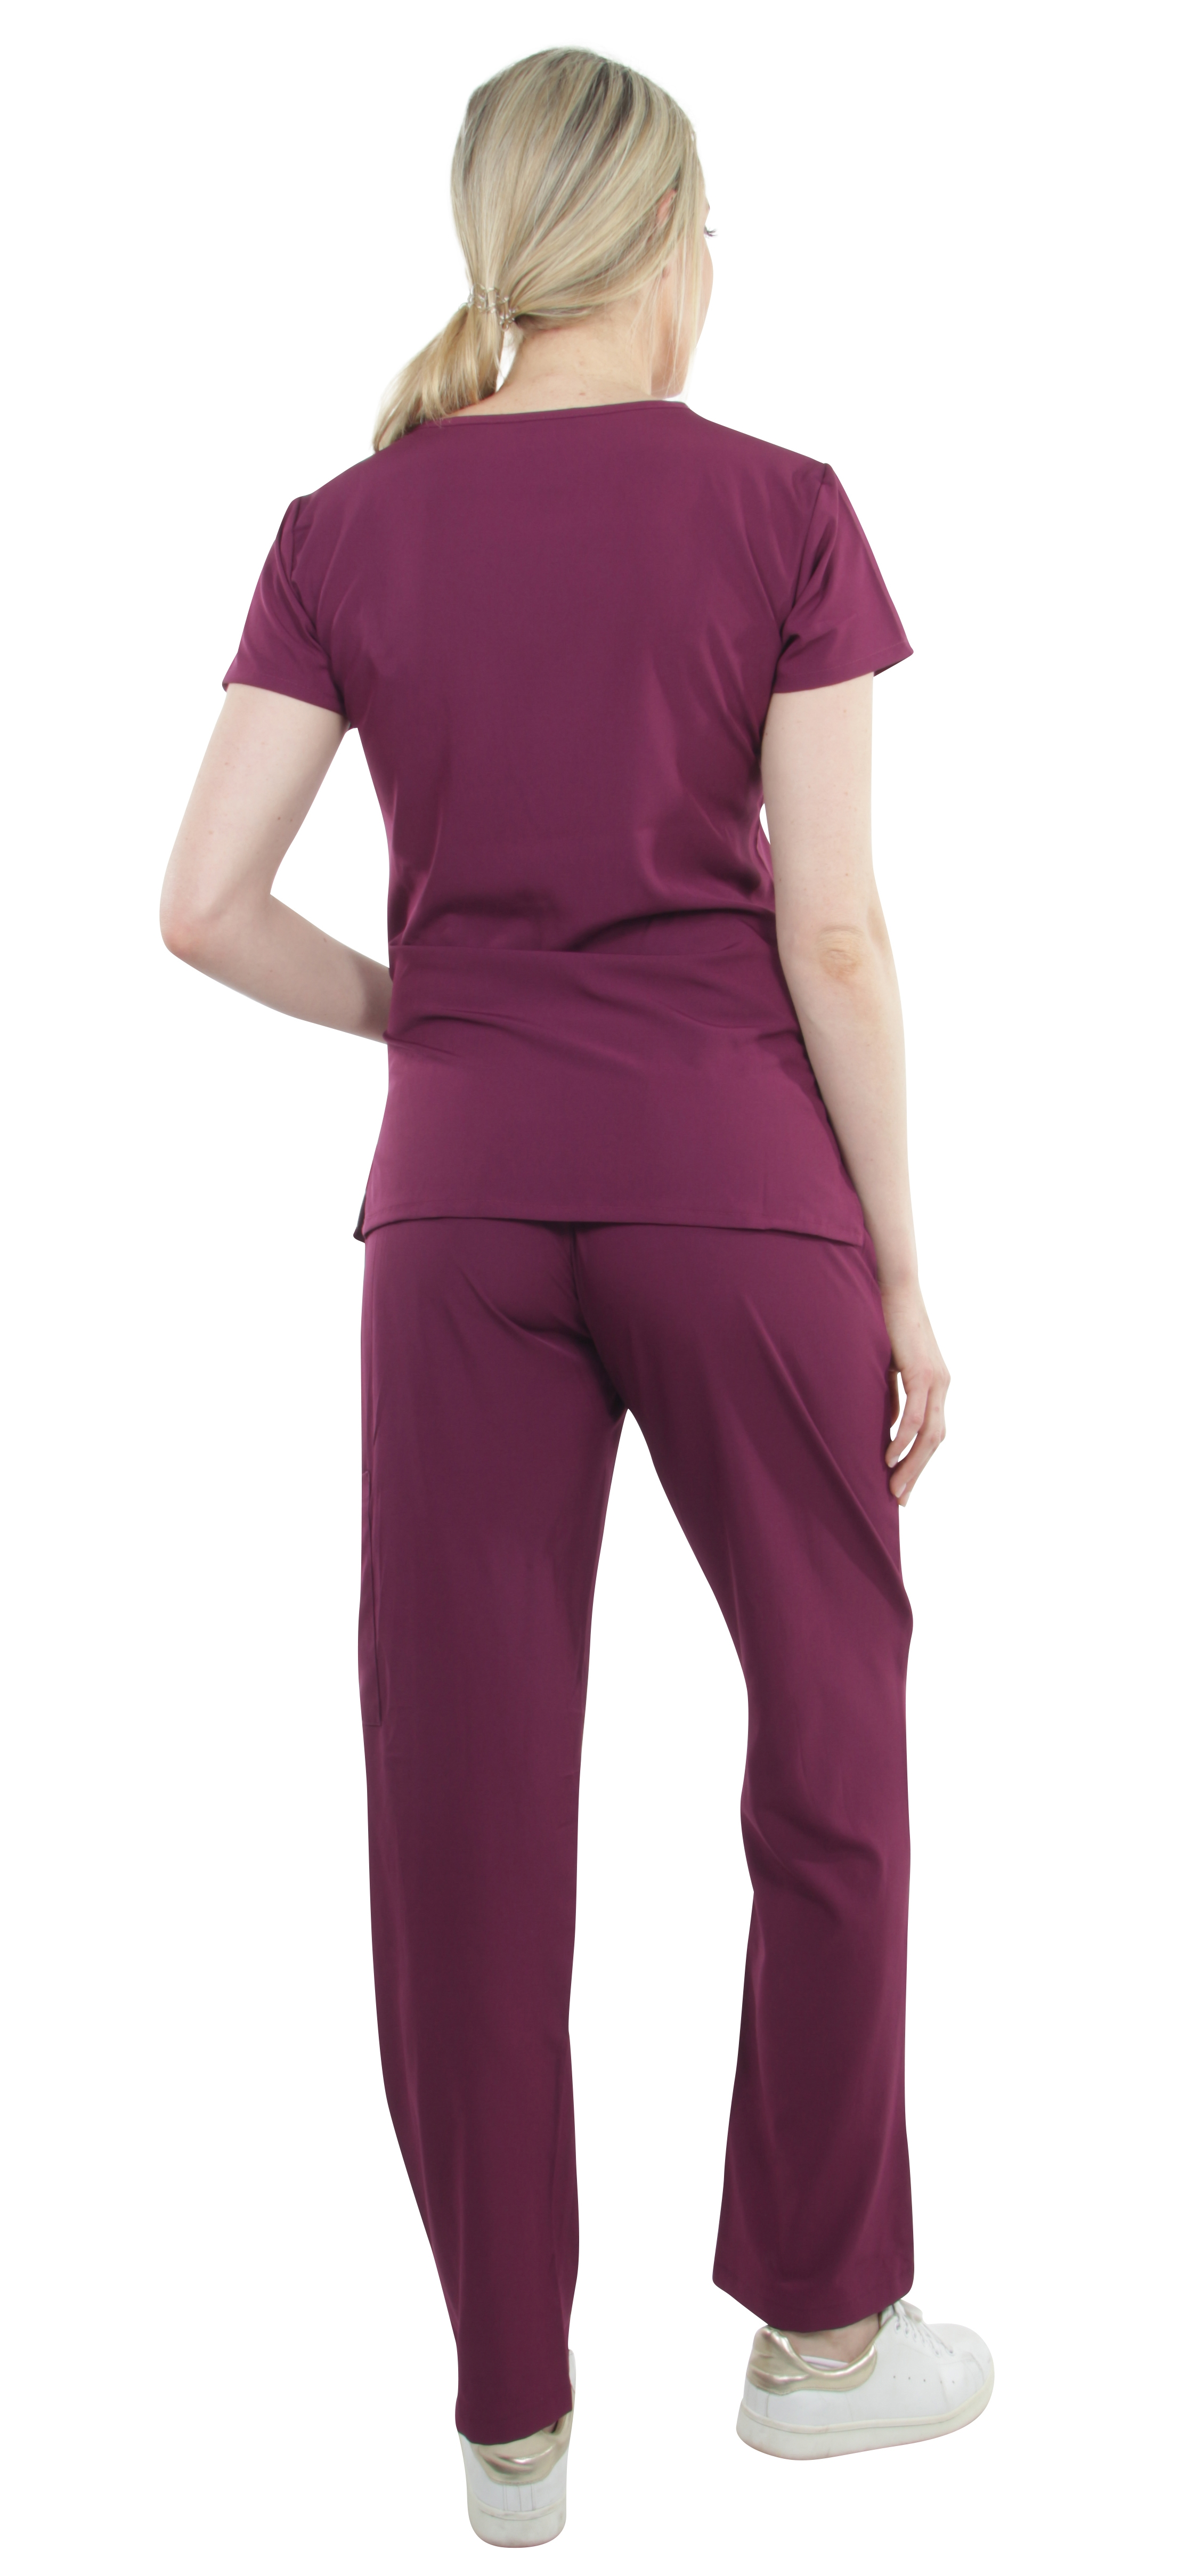 Unisex-Performance-Stretch-Medical-Uniform-Five-Pockets-V-Neck-Scrubs-Sets miniature 11